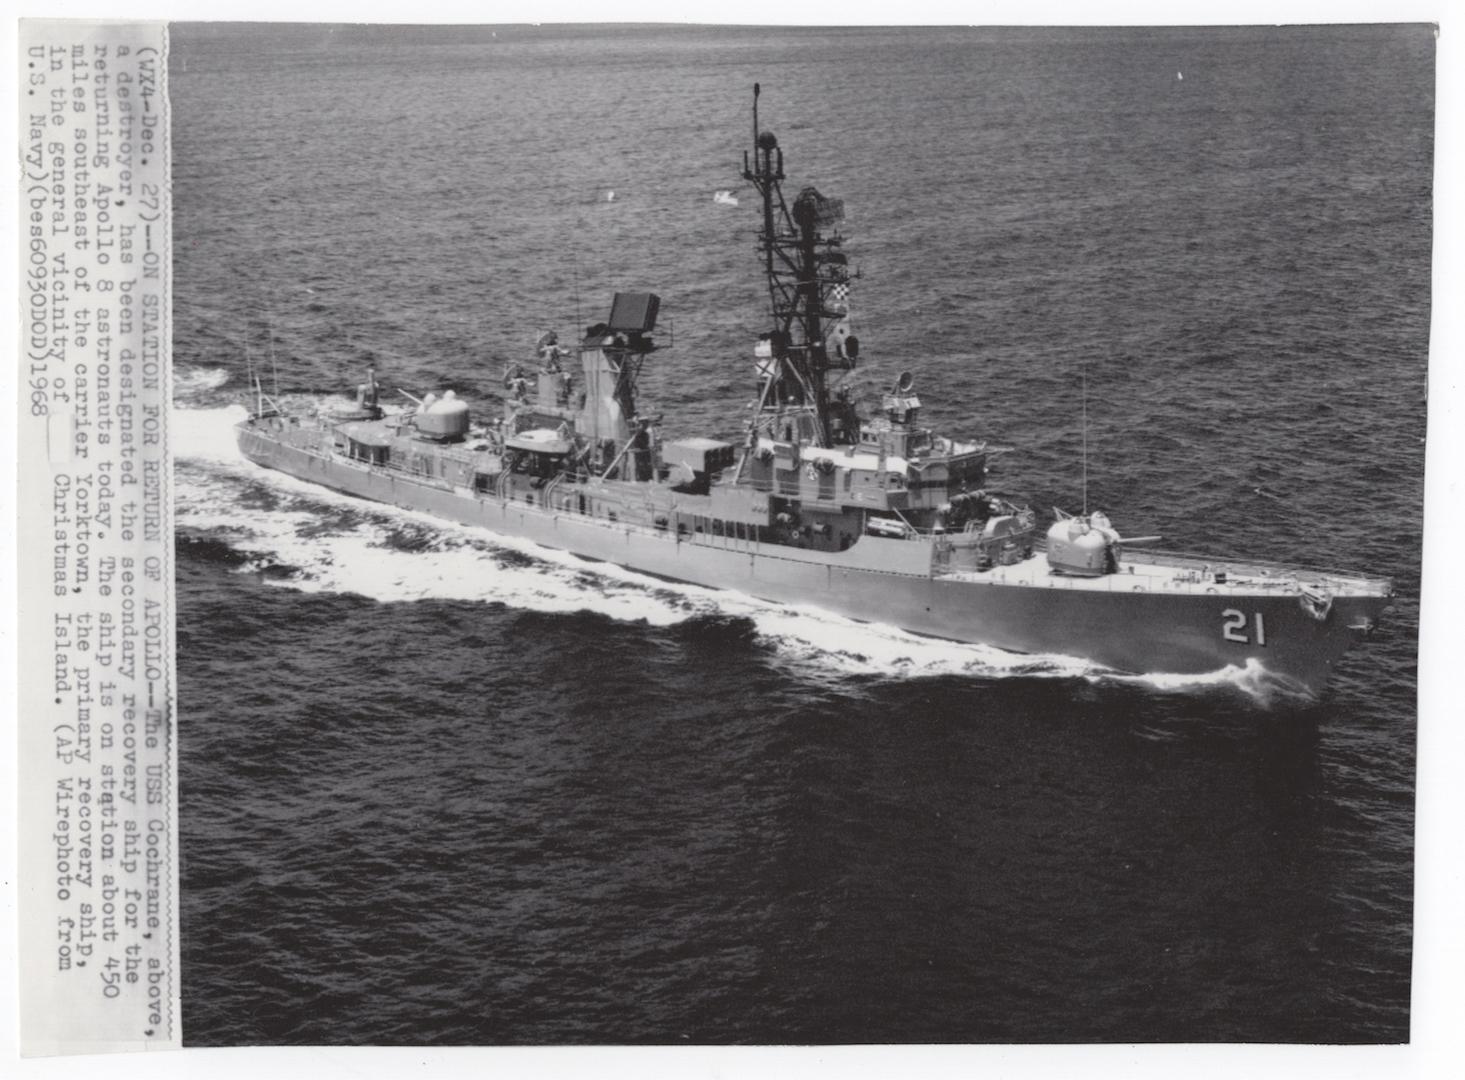 ERM-1968-PHOTO-SPB02872-FRONT.jpg